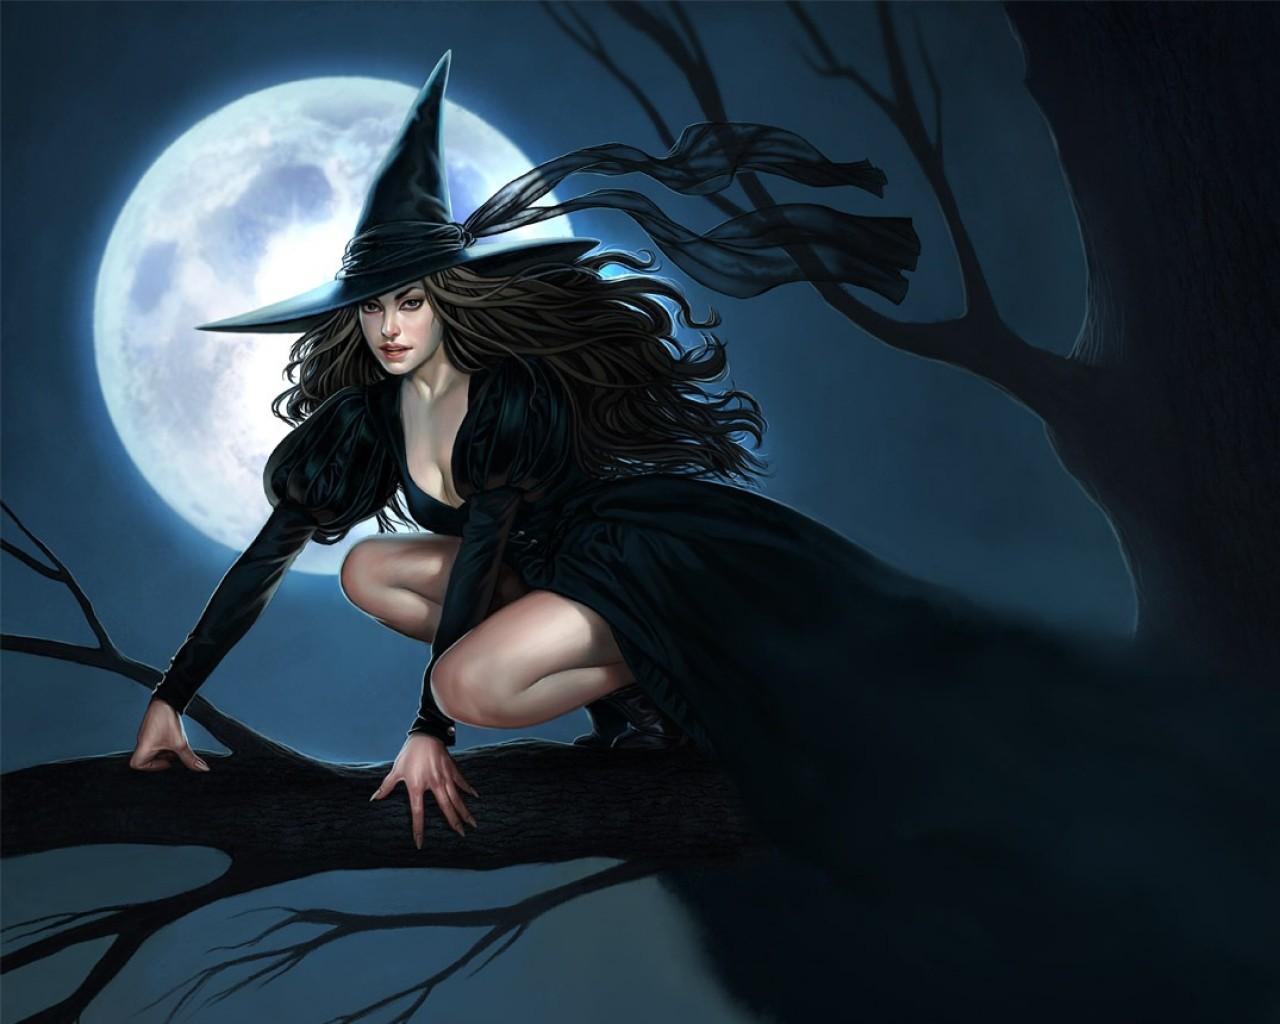 Halloween Witch Wallpapers - WallpaperSafari